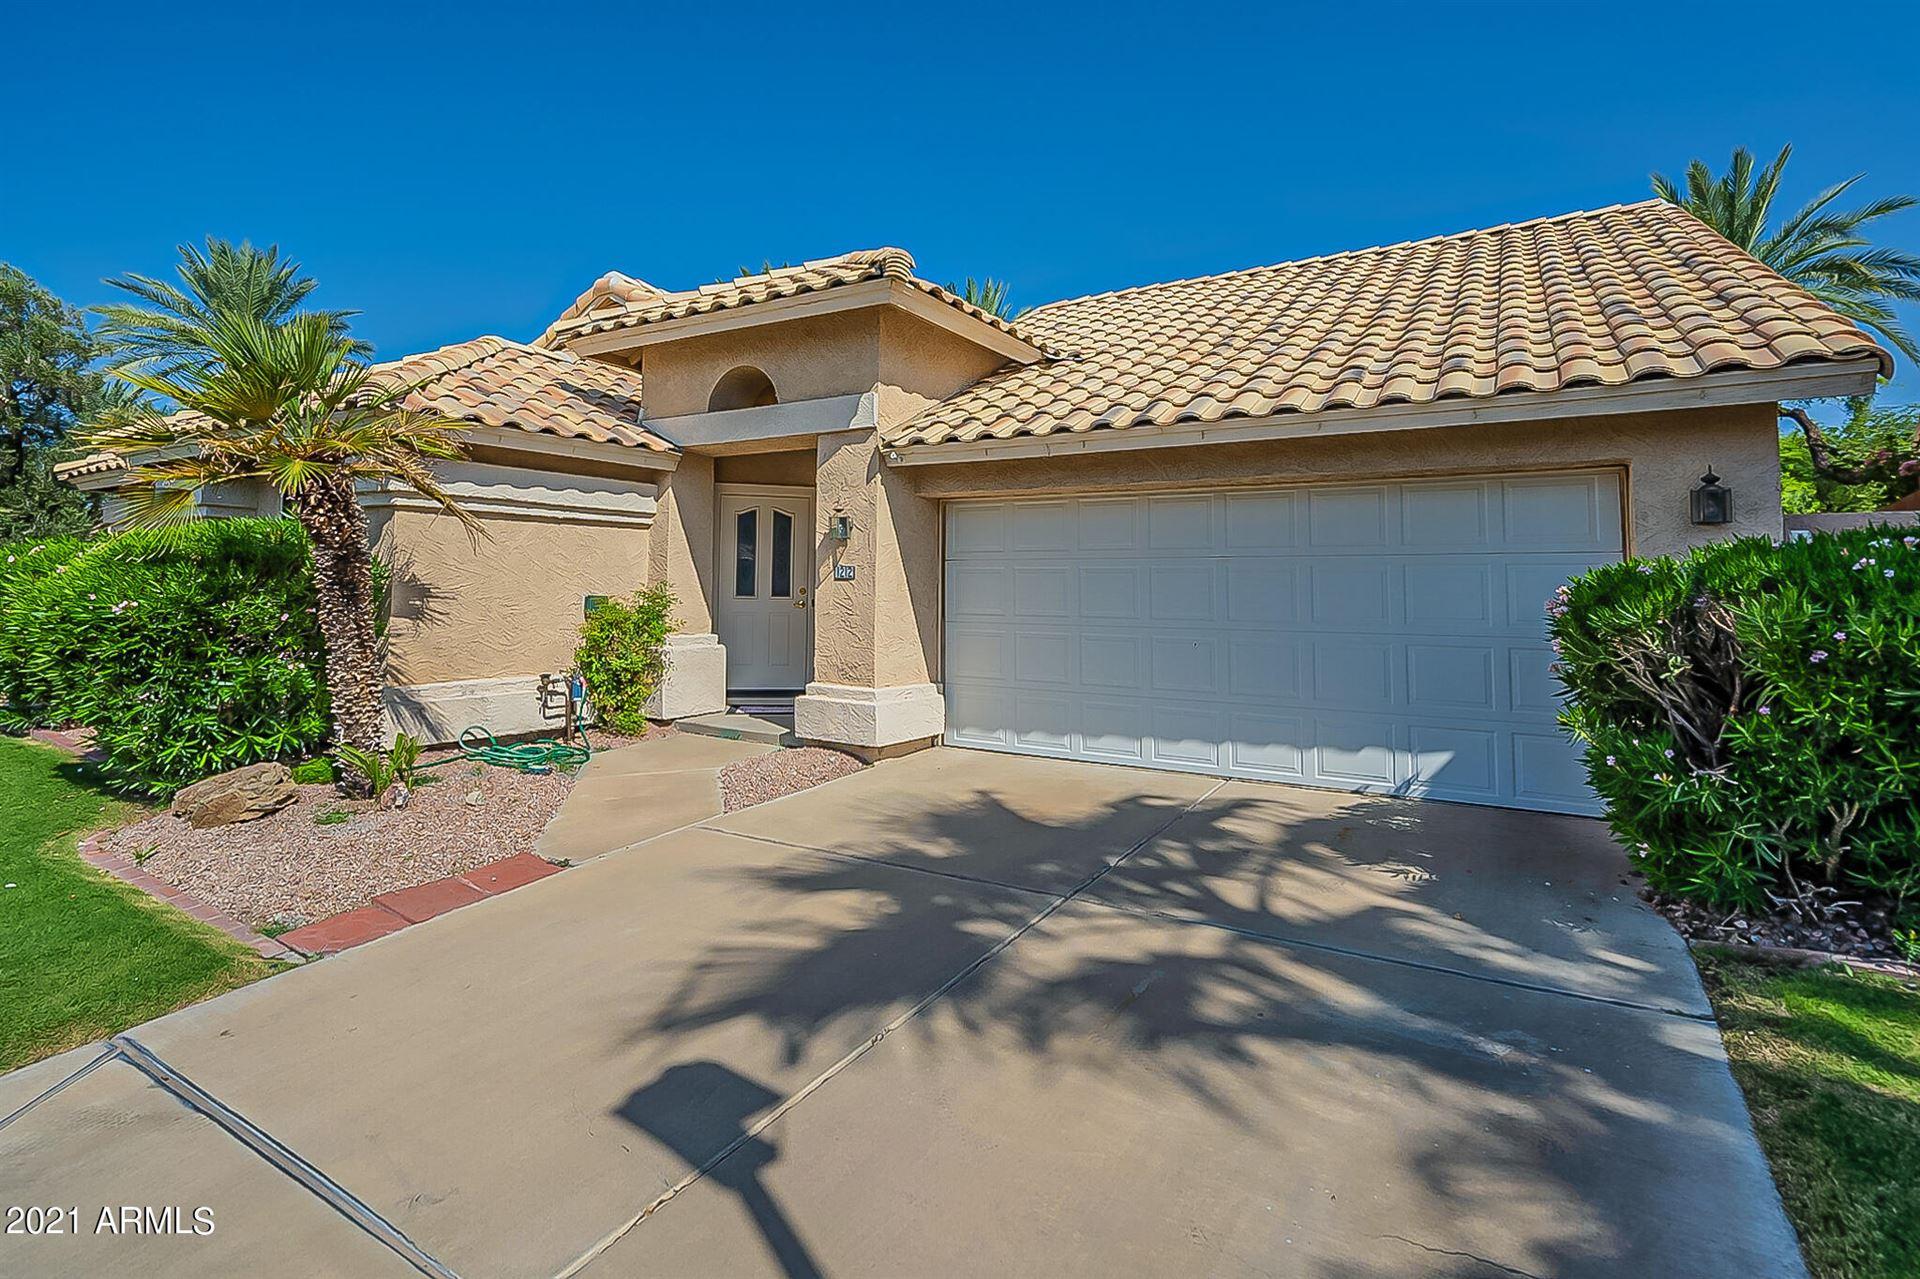 1212 E WILDWOOD Drive, Phoenix, AZ 85048 - MLS#: 6293816